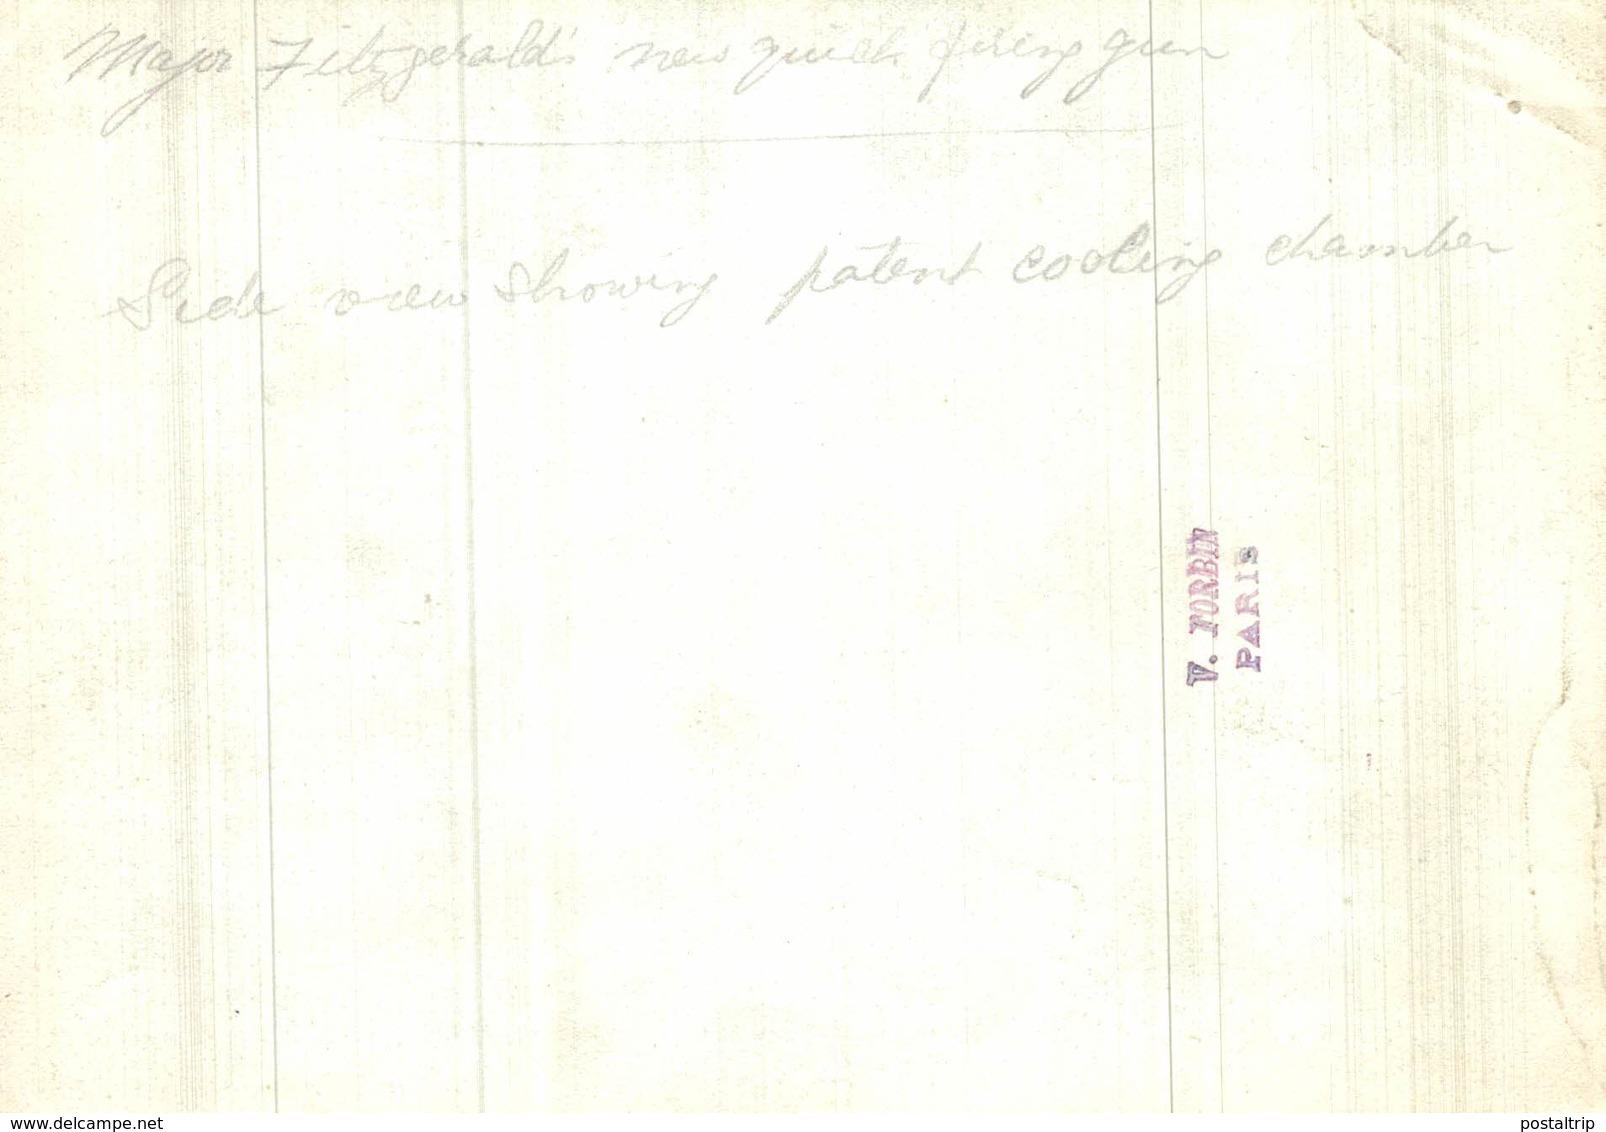 MAJOR FITZGERALD QUICK FIRING GUN PATENT COOLING INVENCIÓN NOUVELLE INVENTION    16*12CM Fonds Victor FORBIN 1864-1947 - War, Military